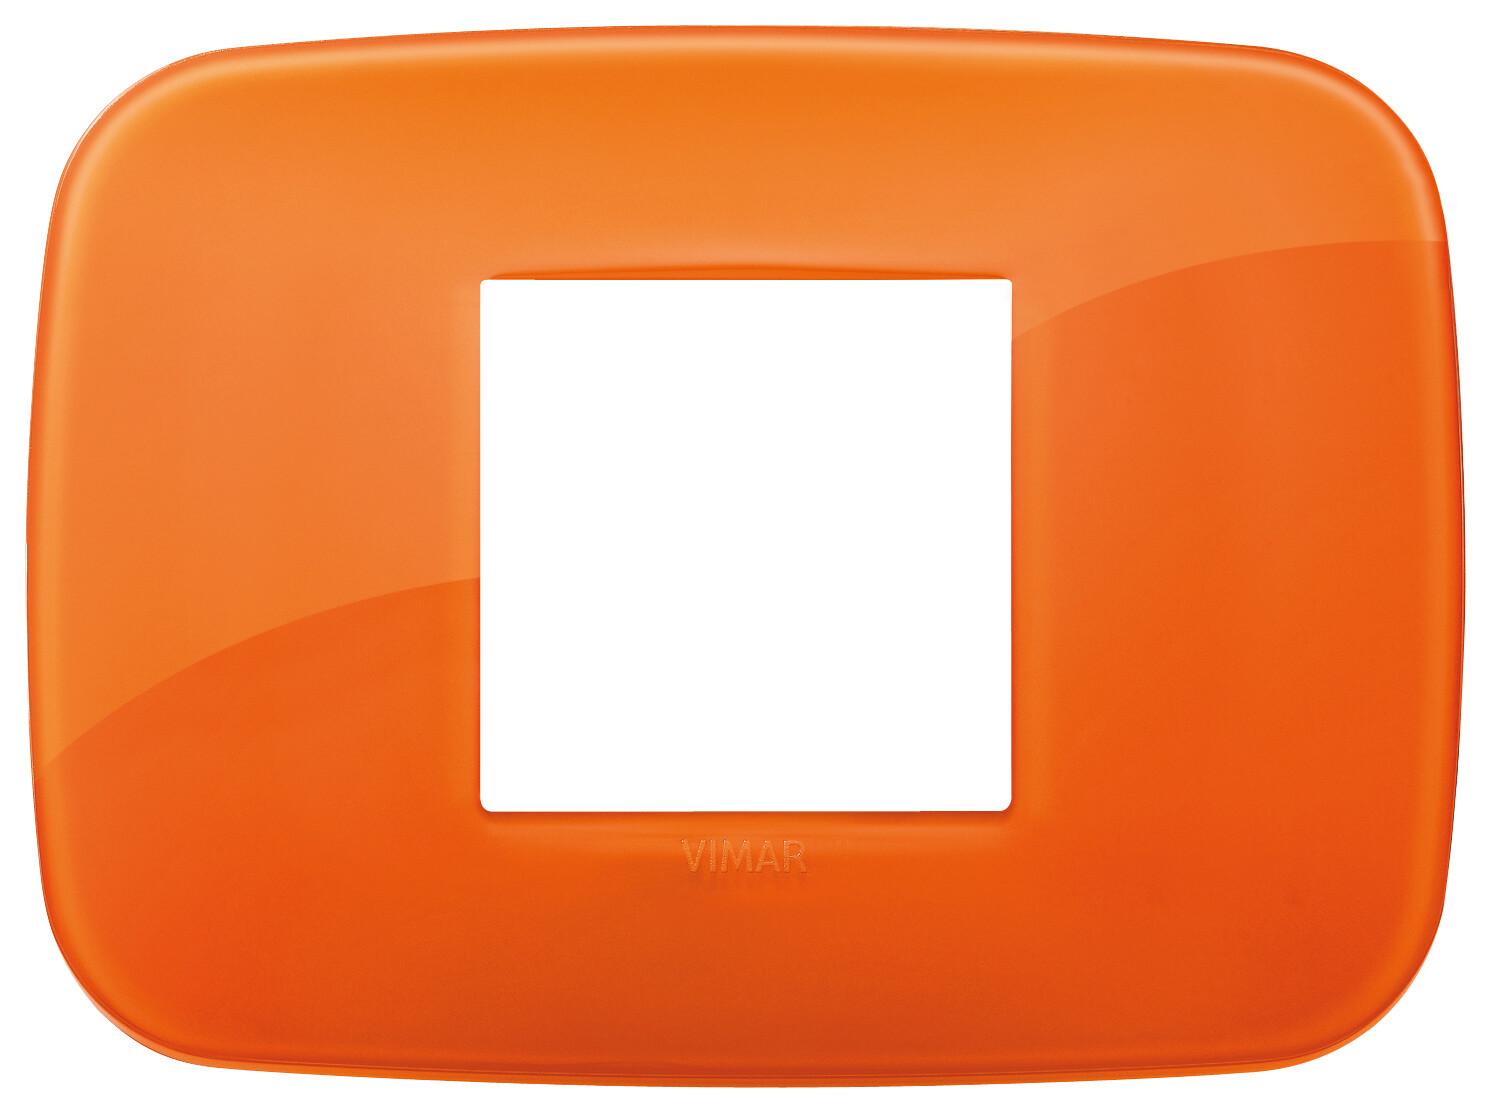 Накладка ROUND на 2 модуля центрально Reflex оранжевая